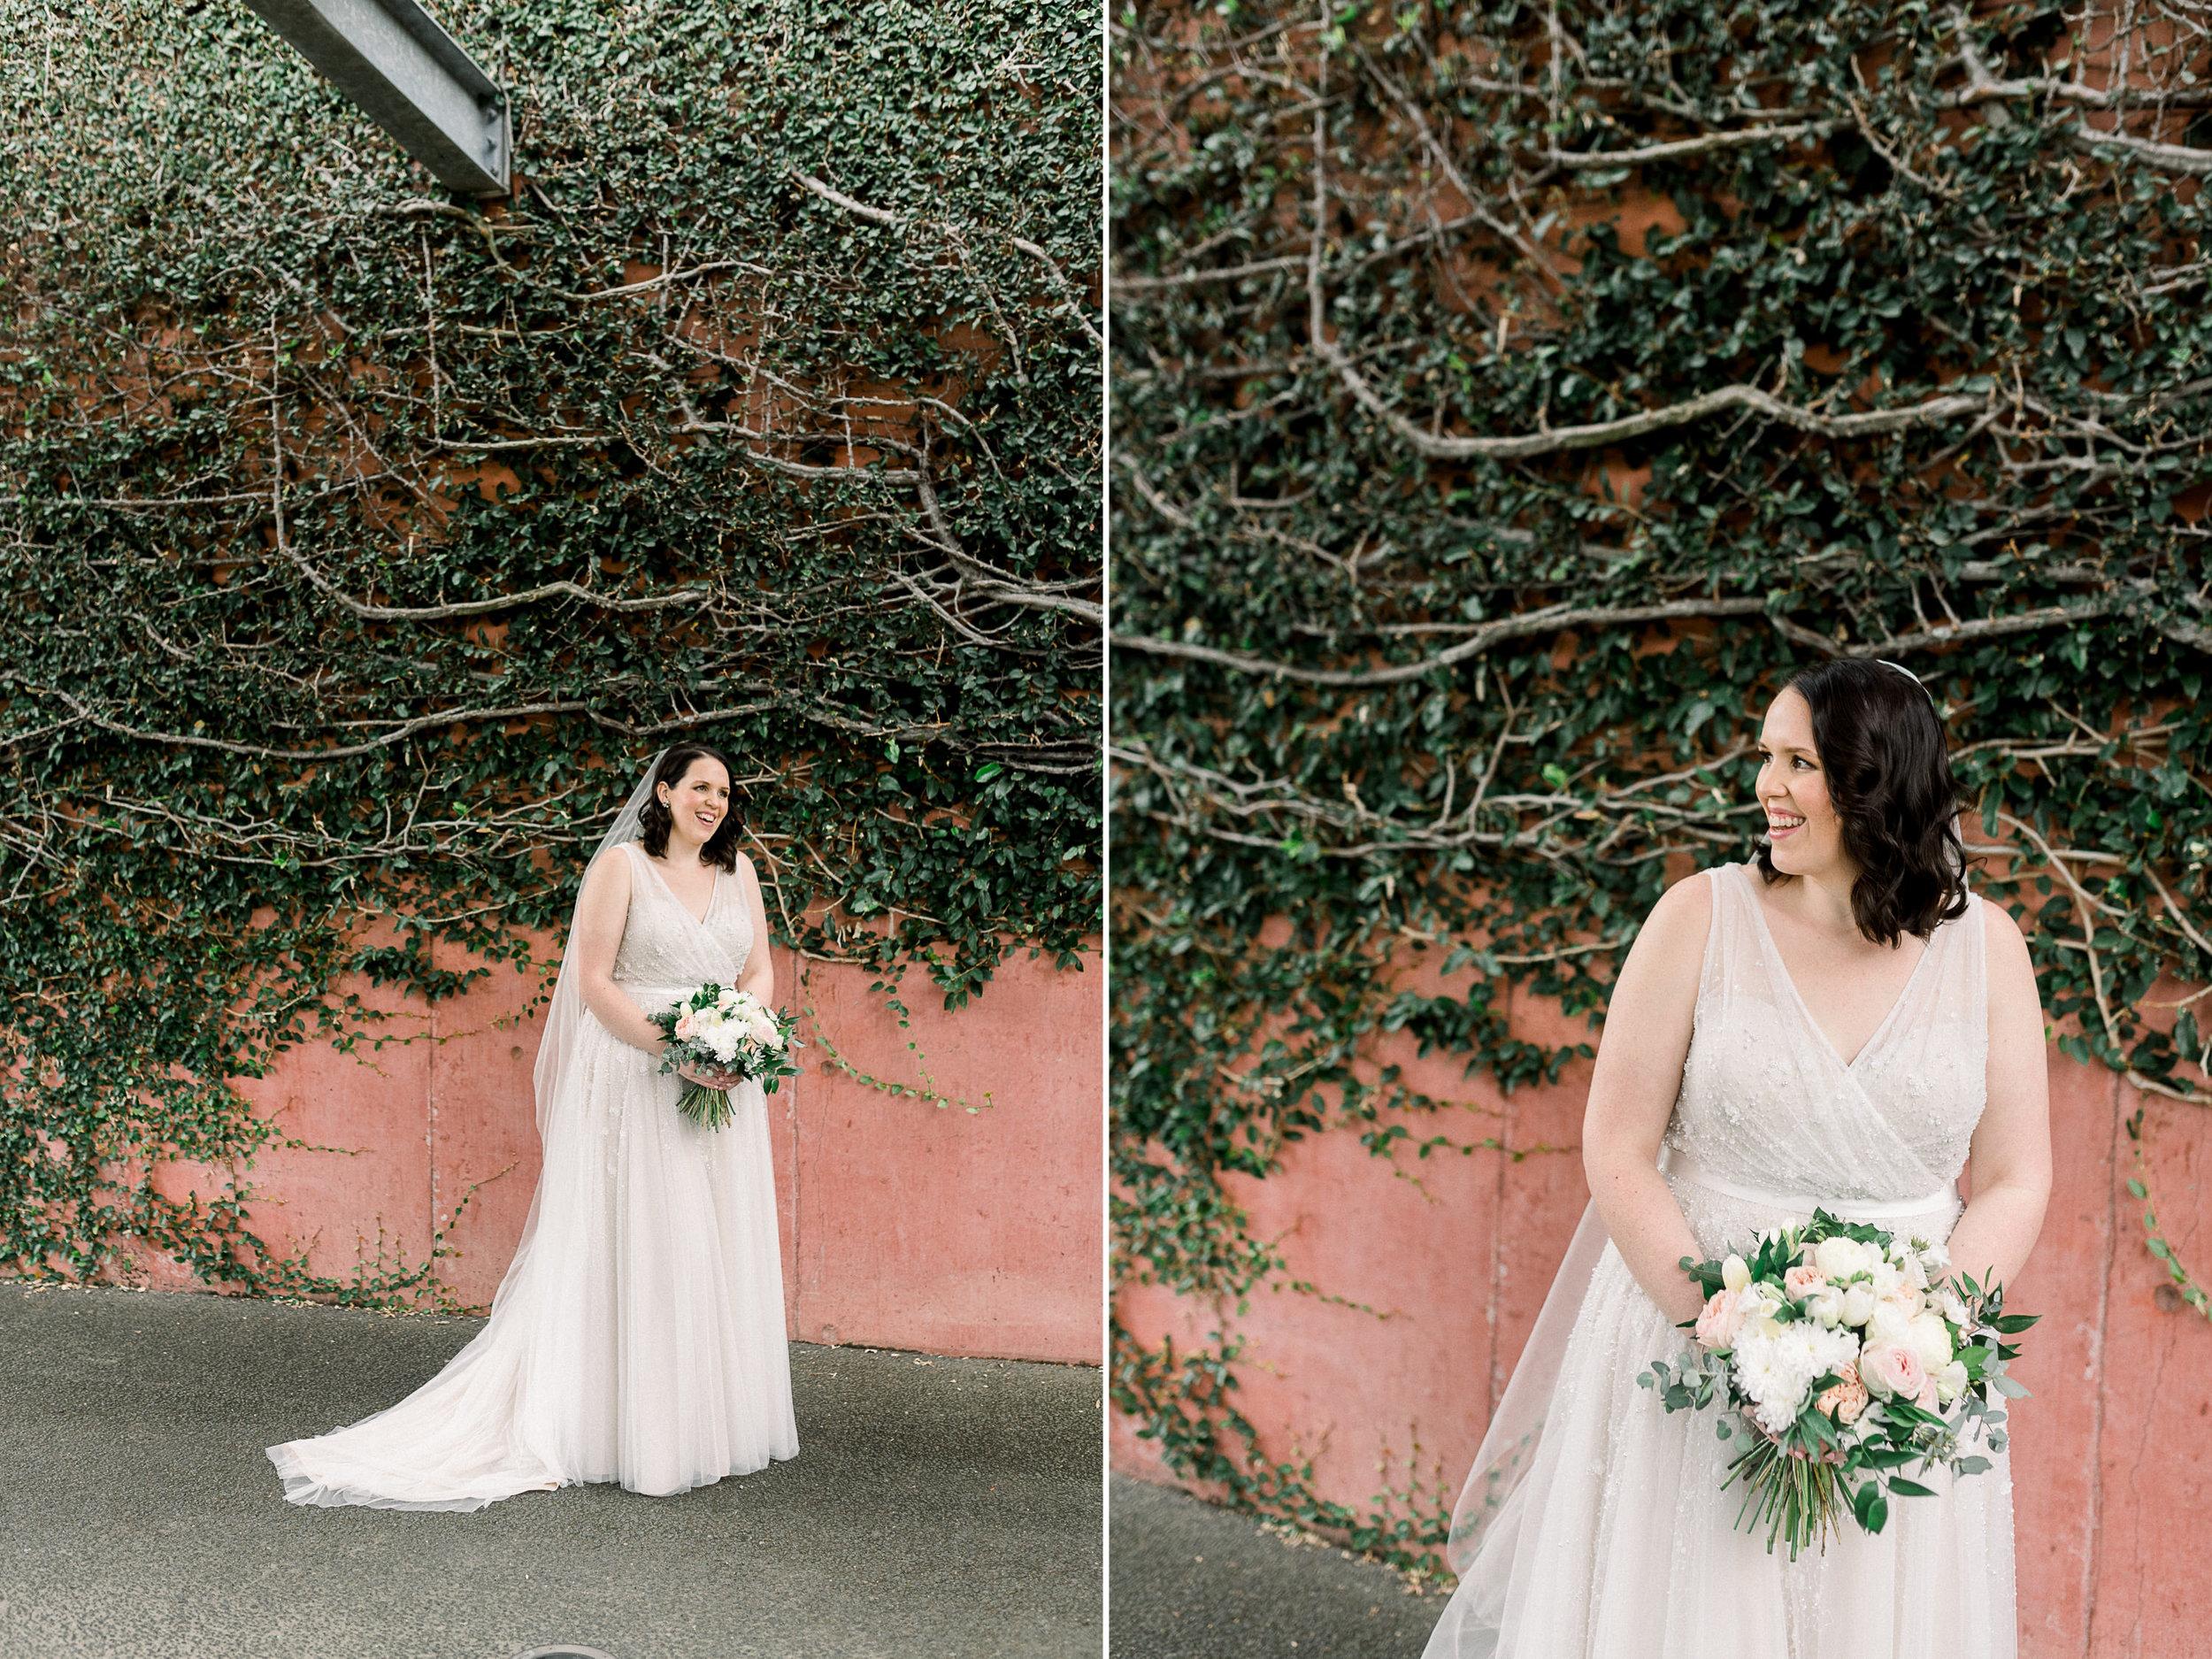 brisbane-city-wedding-romantic-bridal-photos-roma-st-3.jpg